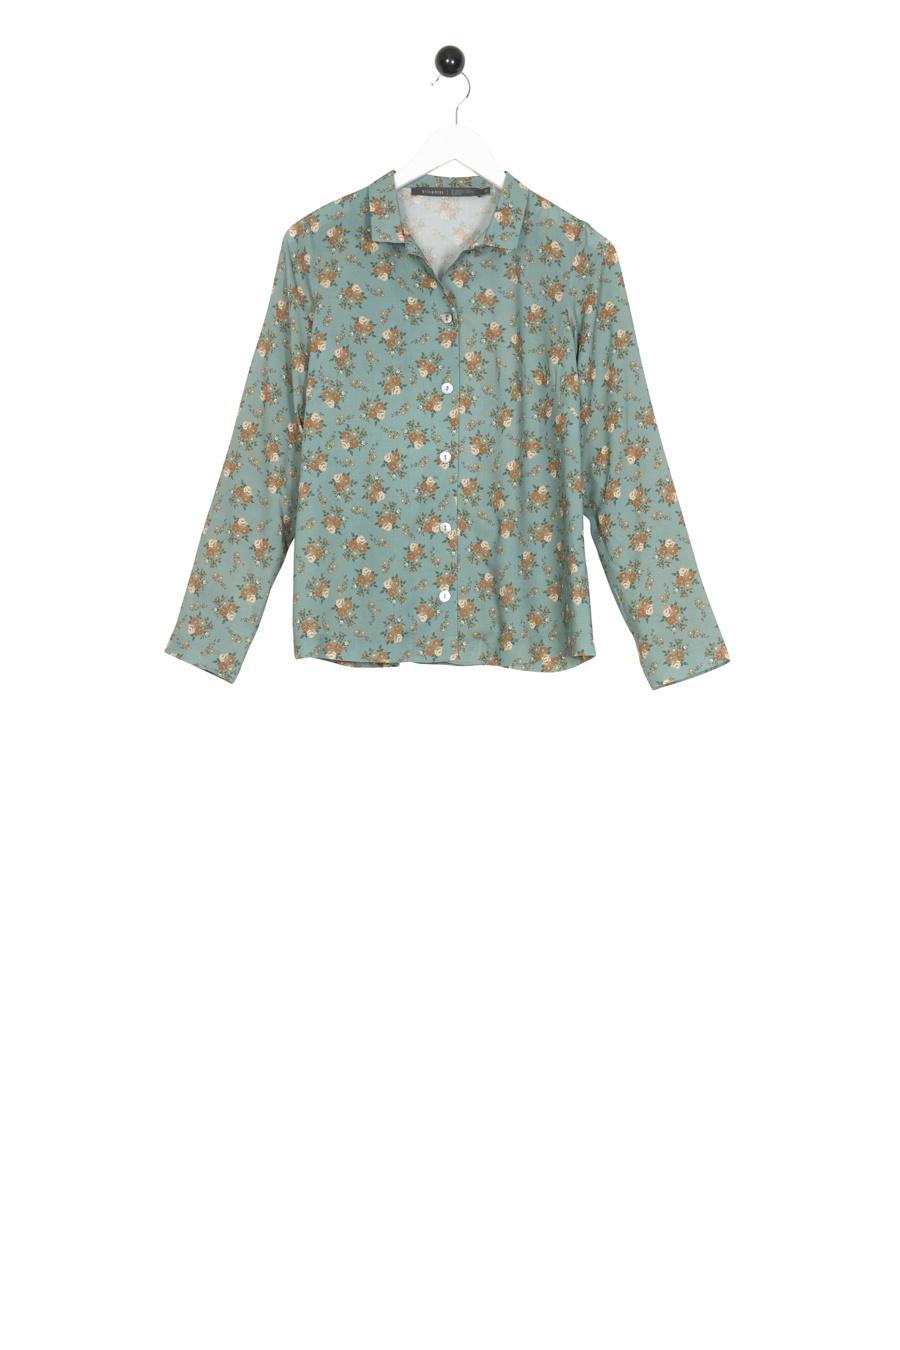 Övraby Shirt